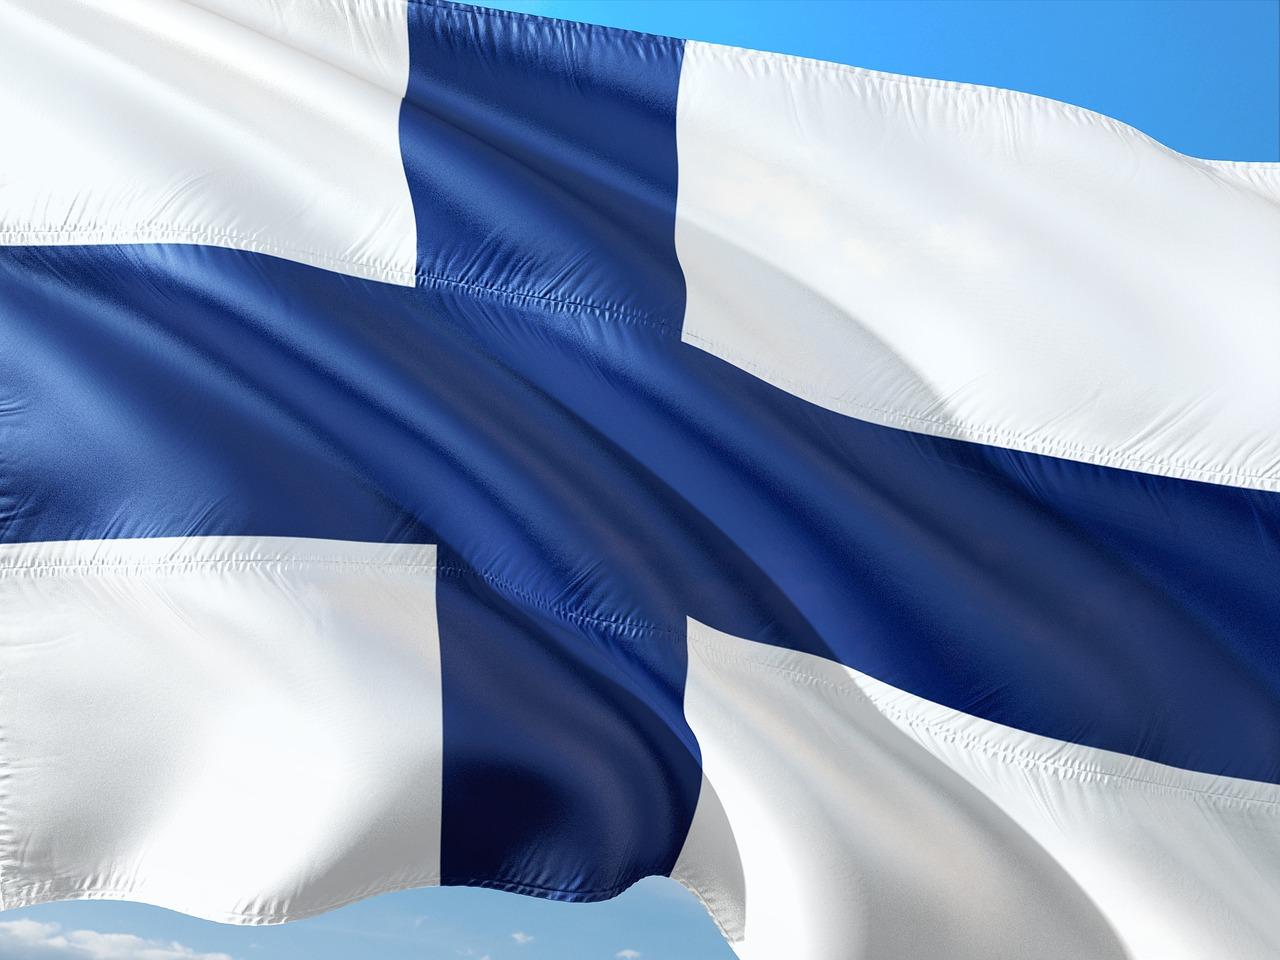 Soome.Pixabay